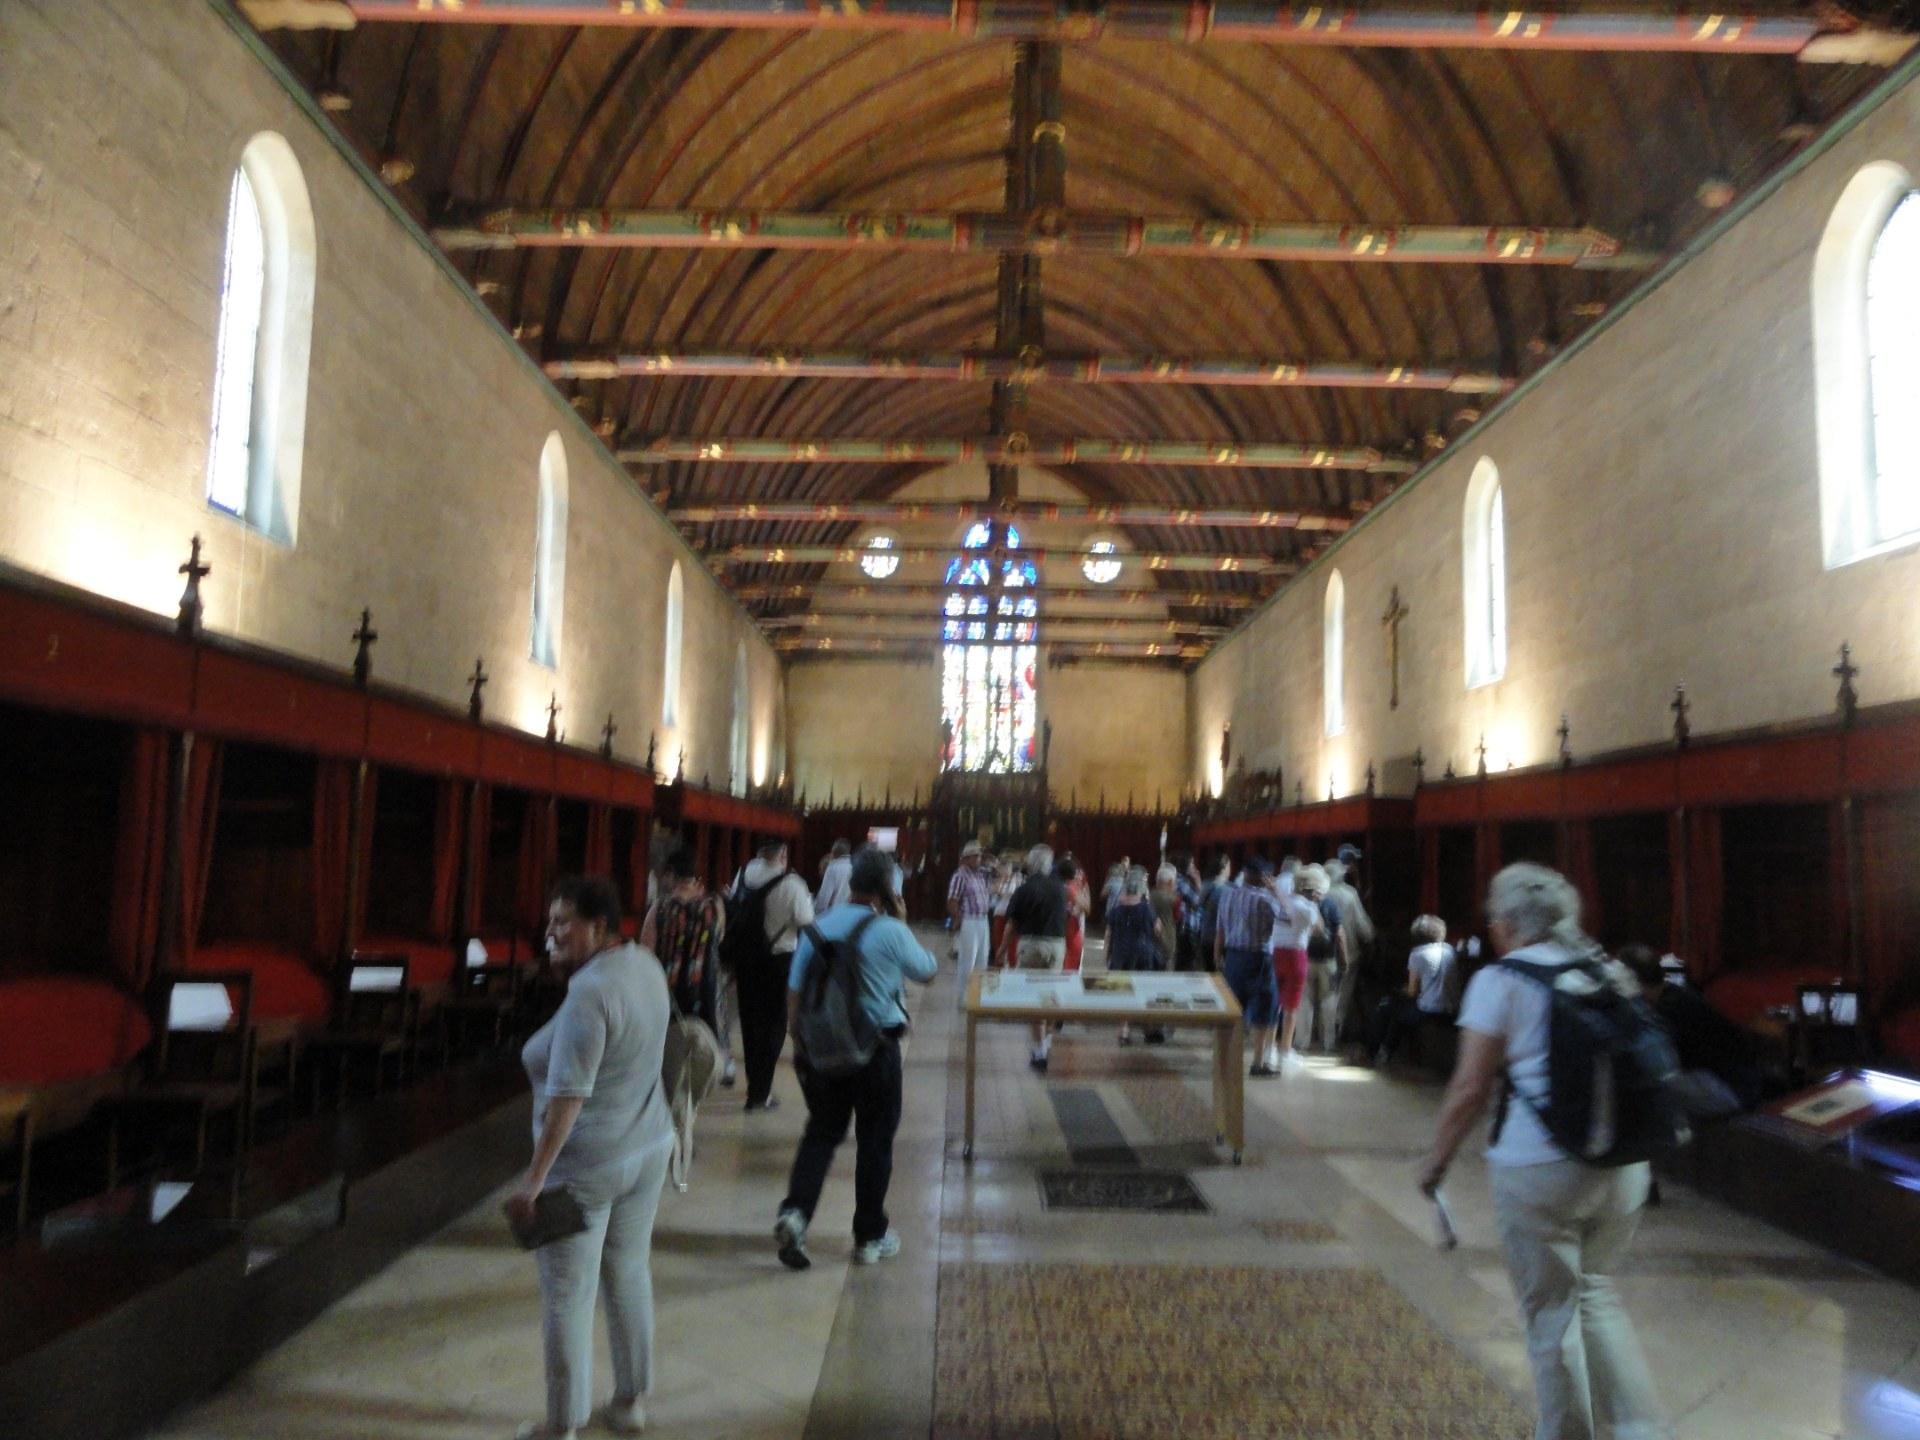 2017-06-16 - Pe#lerinage en Bourgogne - 151